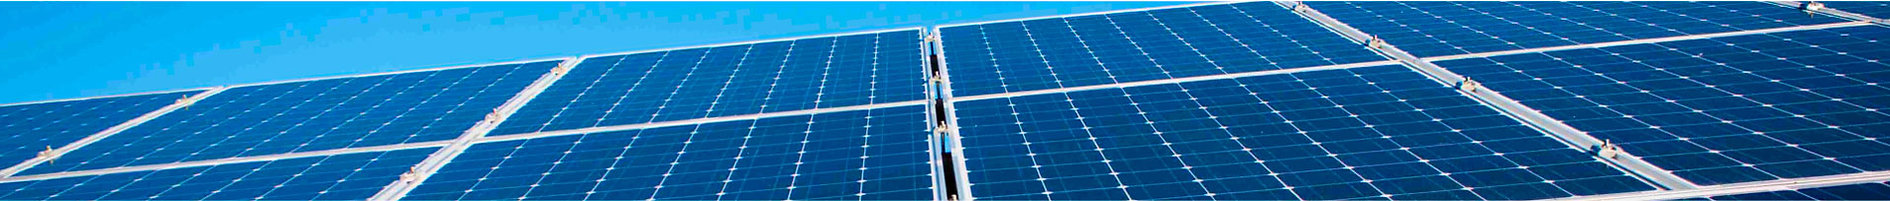 energia-fotovoltaica-wccsolar.jpg